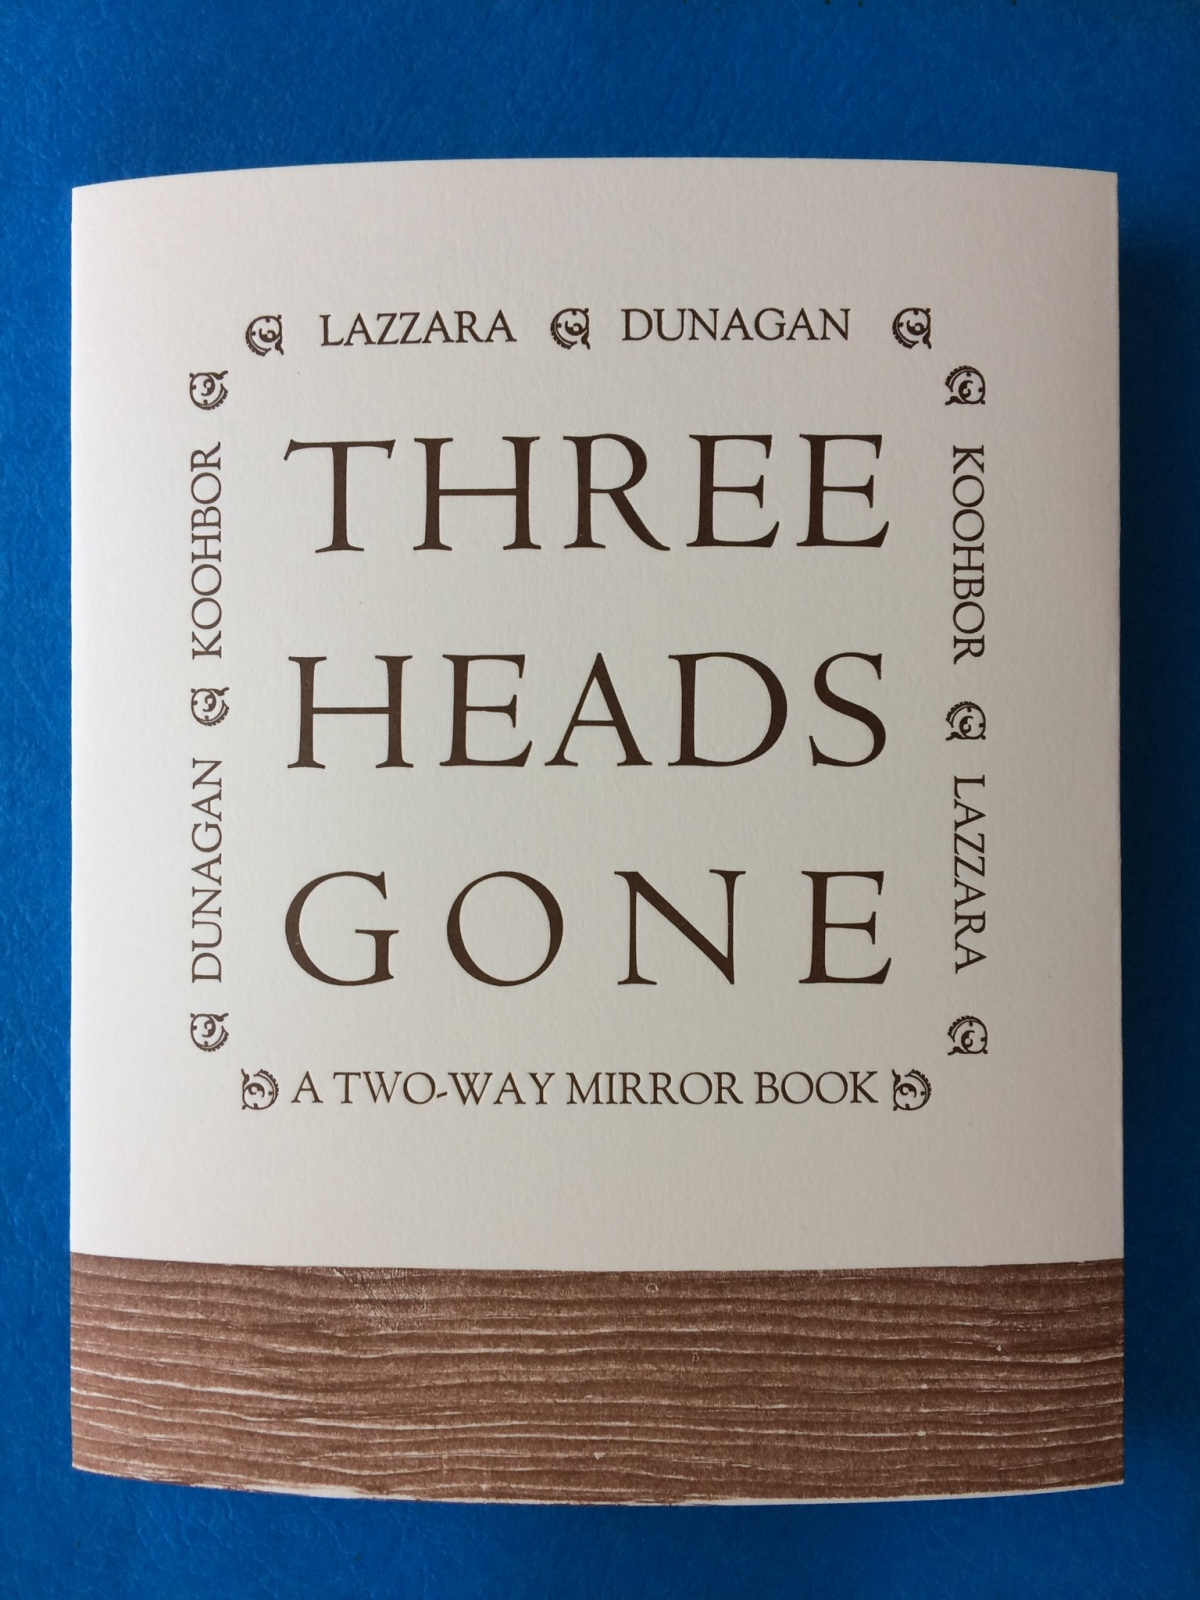 Three Heads Gone, by Patrick James Dunagan, Ava Koohbor, and Marina Lazzara (Two Way Mirror Books) -- designed and printed at Impart Ink